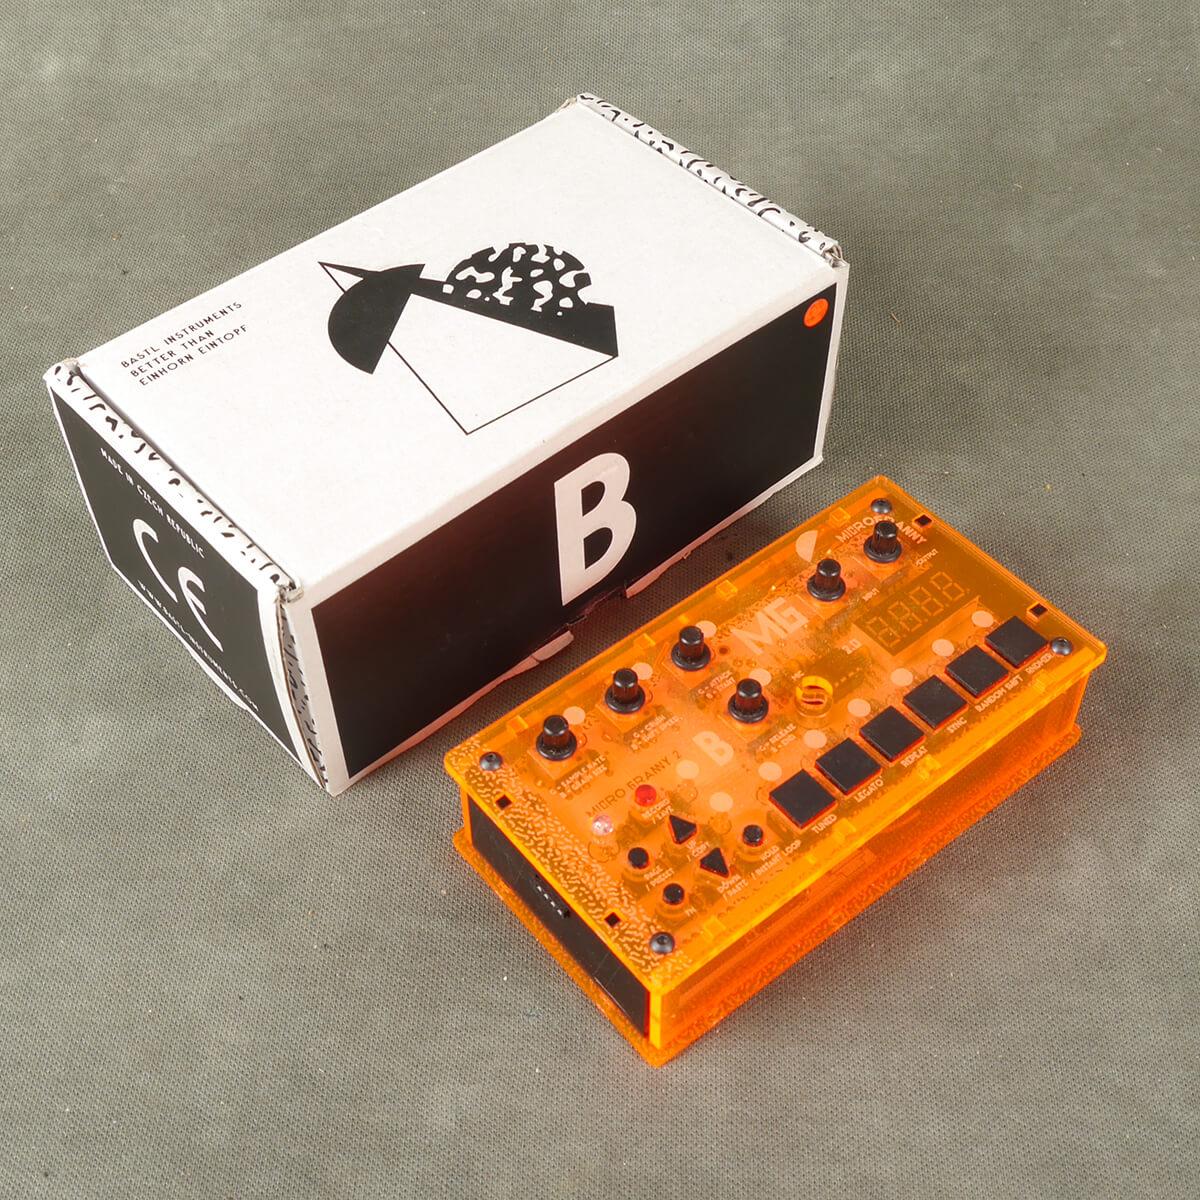 Bastl Instruments Micro Granny 2.5 Granular Synth w/Box - 2nd Hand